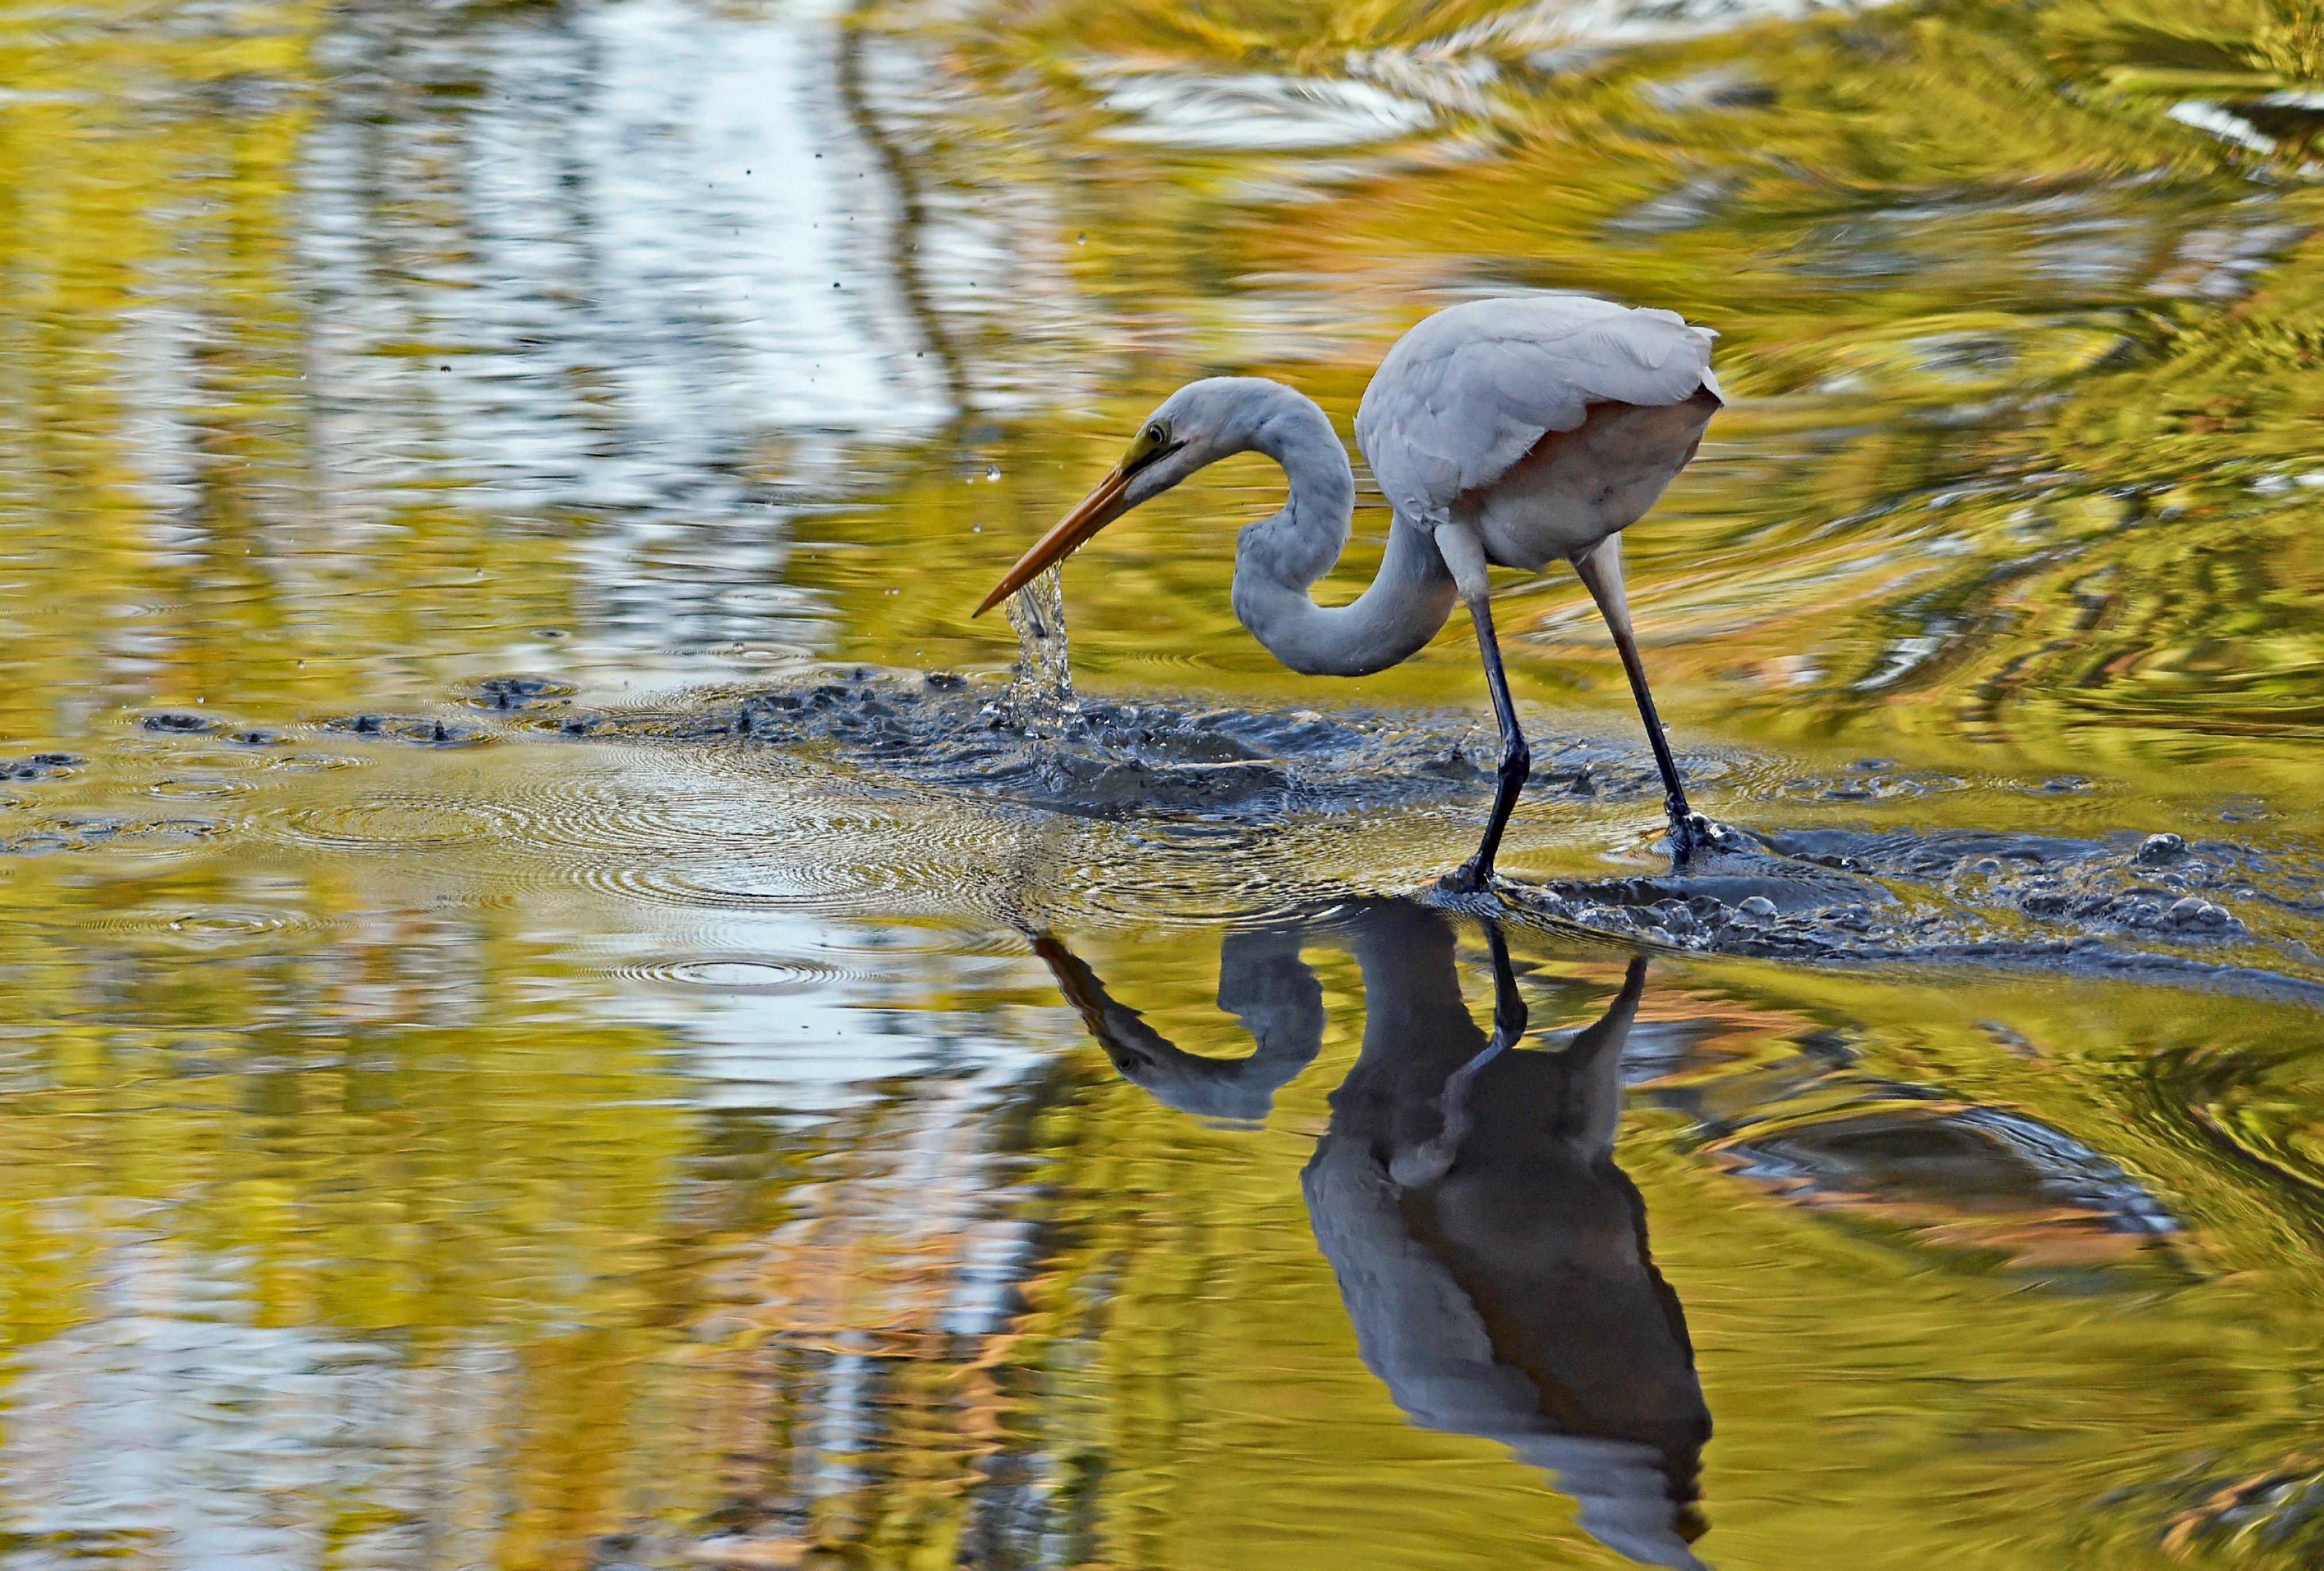 white flamingo on body of water